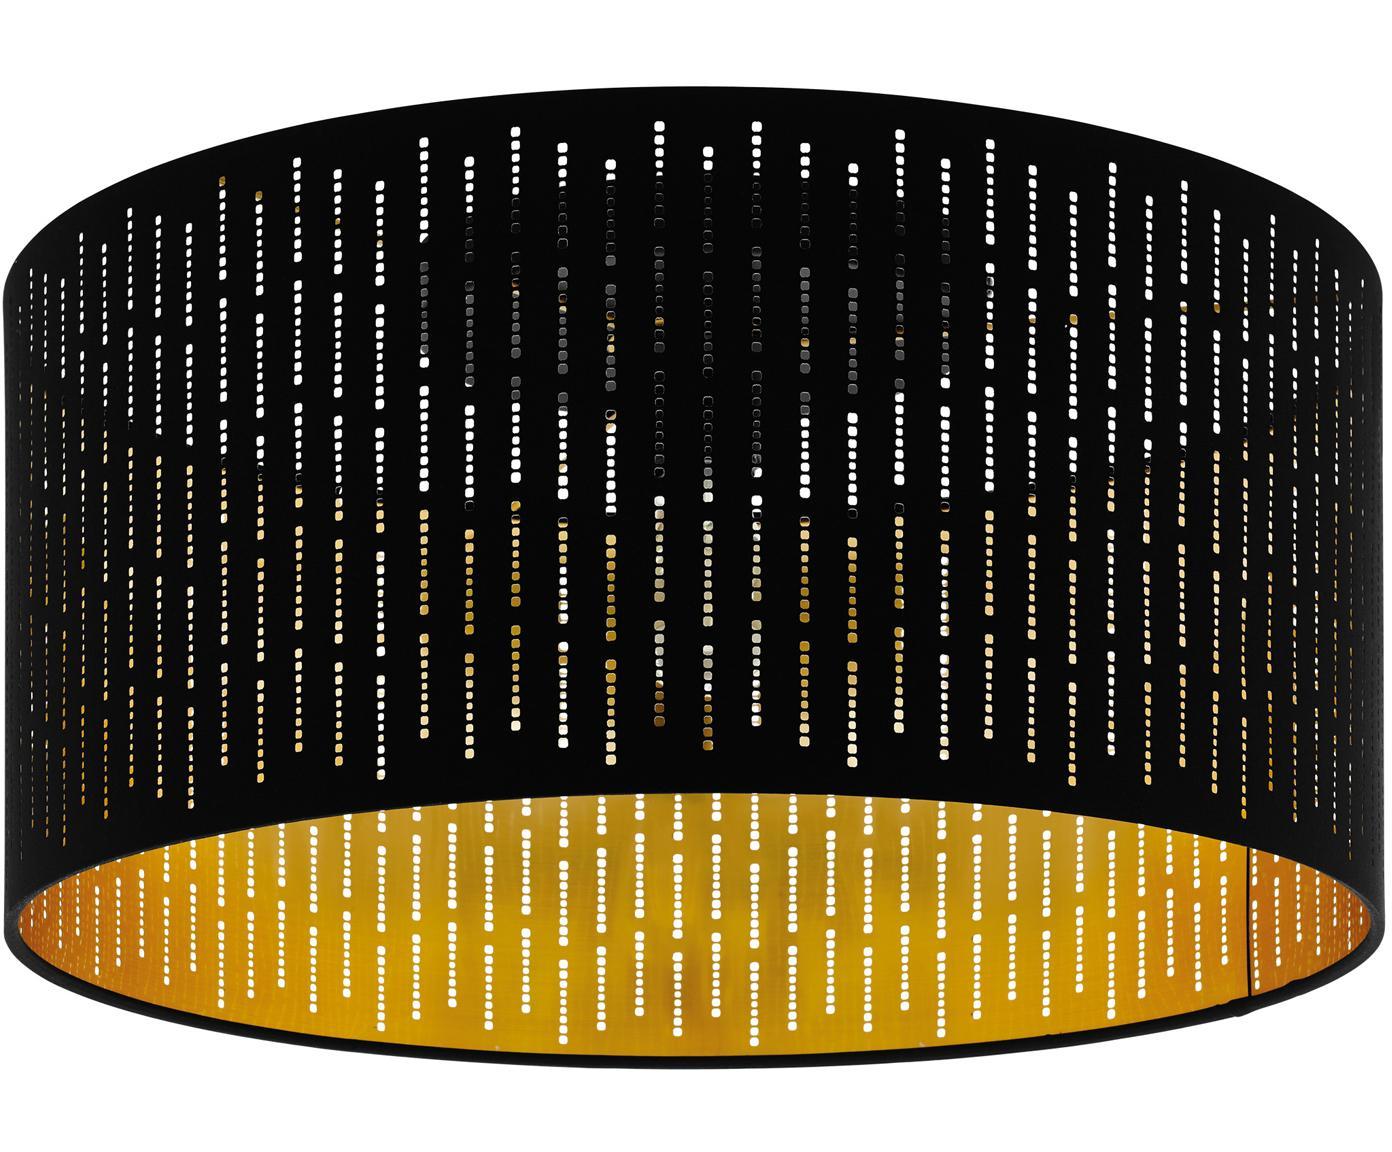 Plafón Varillas, Pantalla: poliéster, Estructura: acero, Negro, dorado, Ø 48 x Al 30 cm